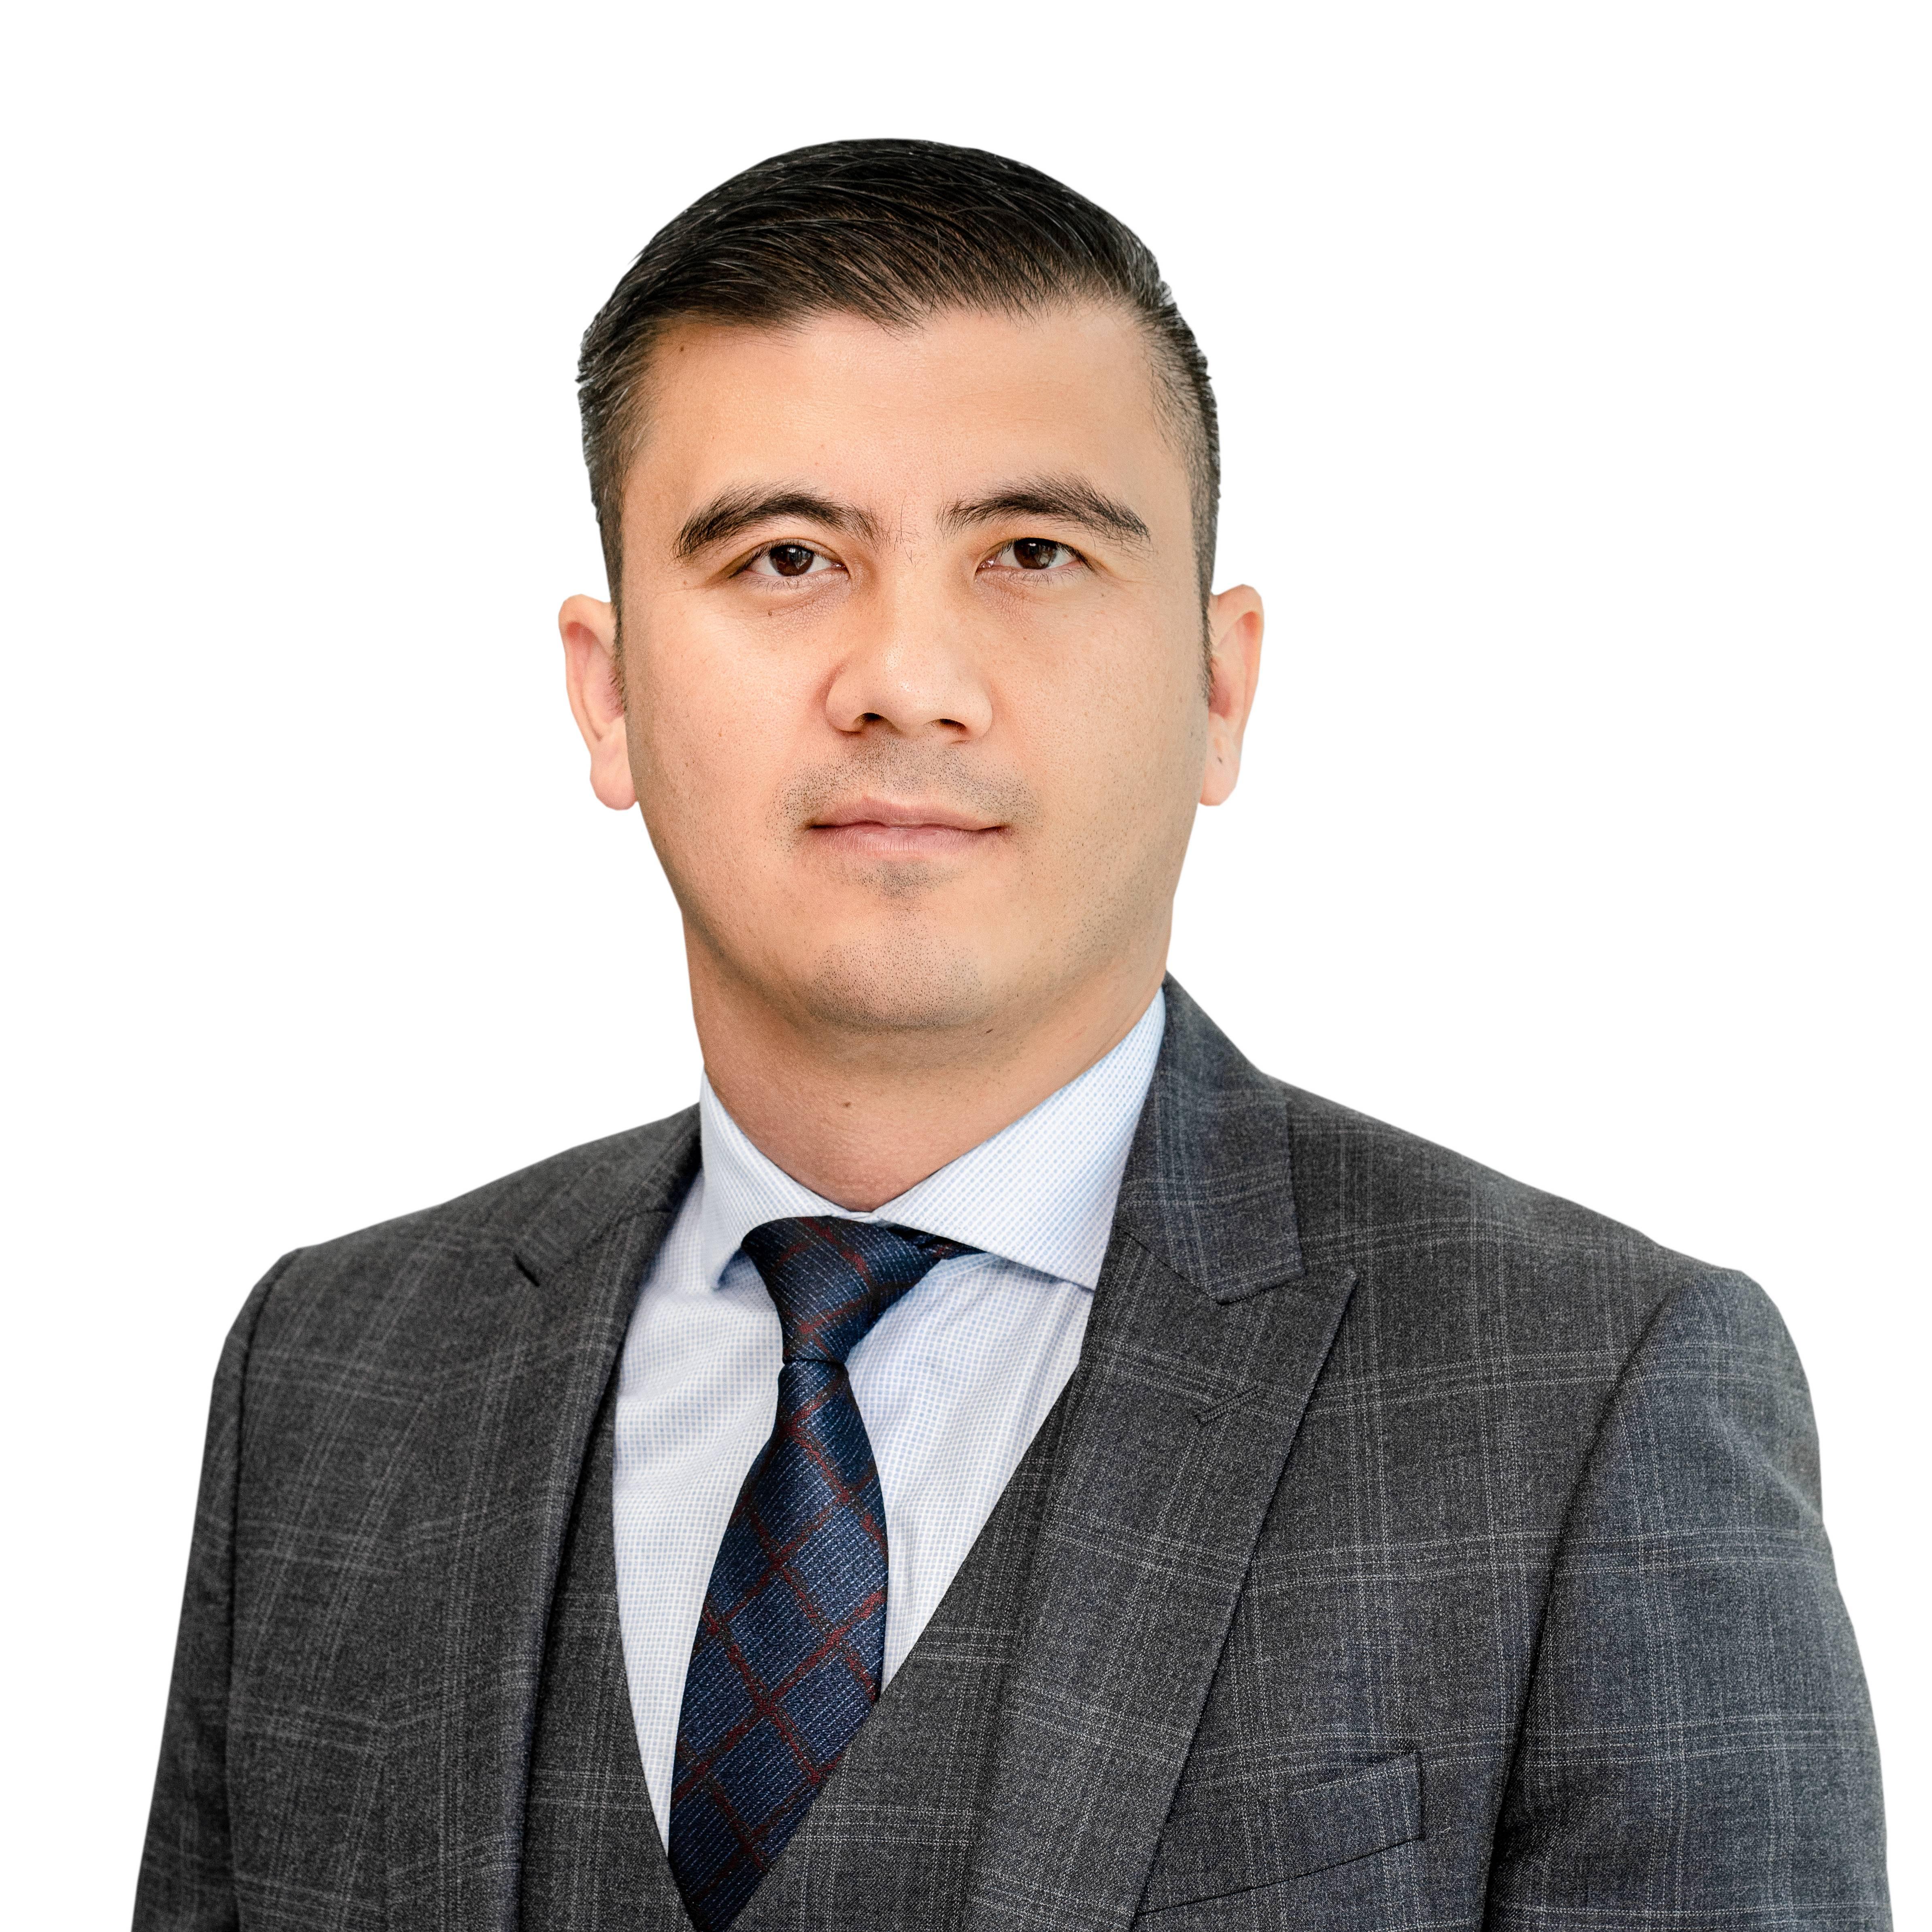 Sherzod Davlatov